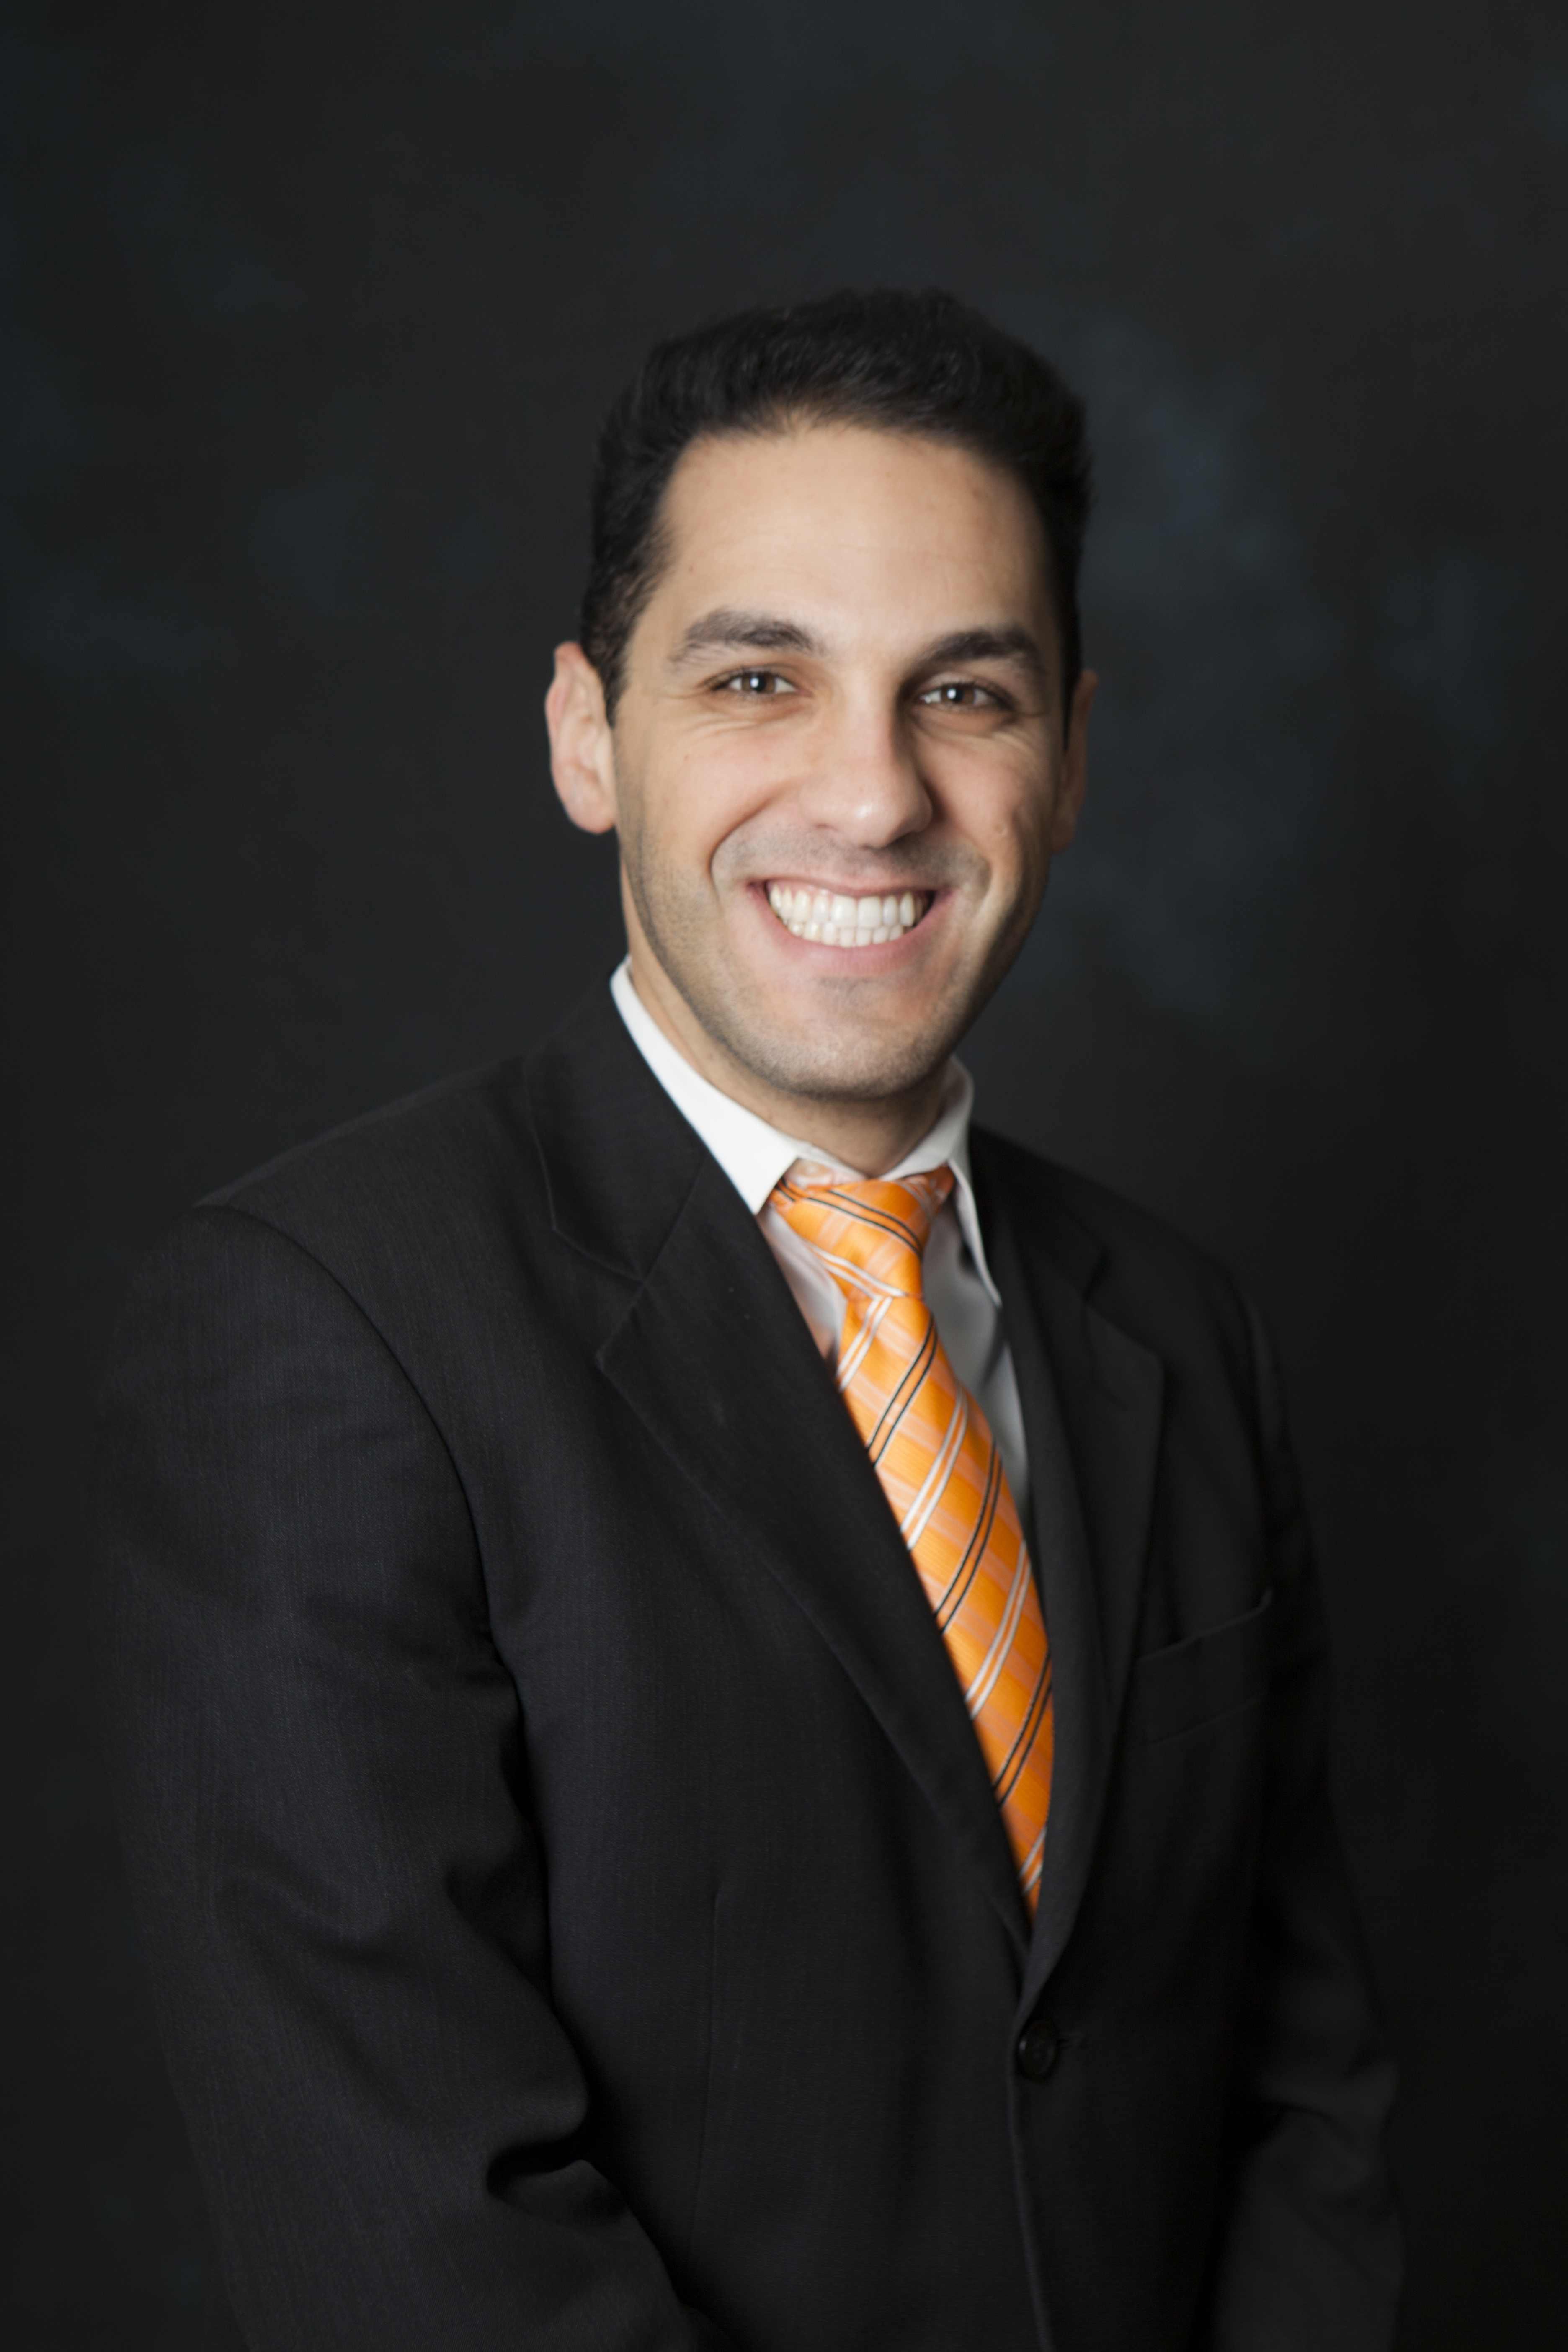 Yoel Saidian